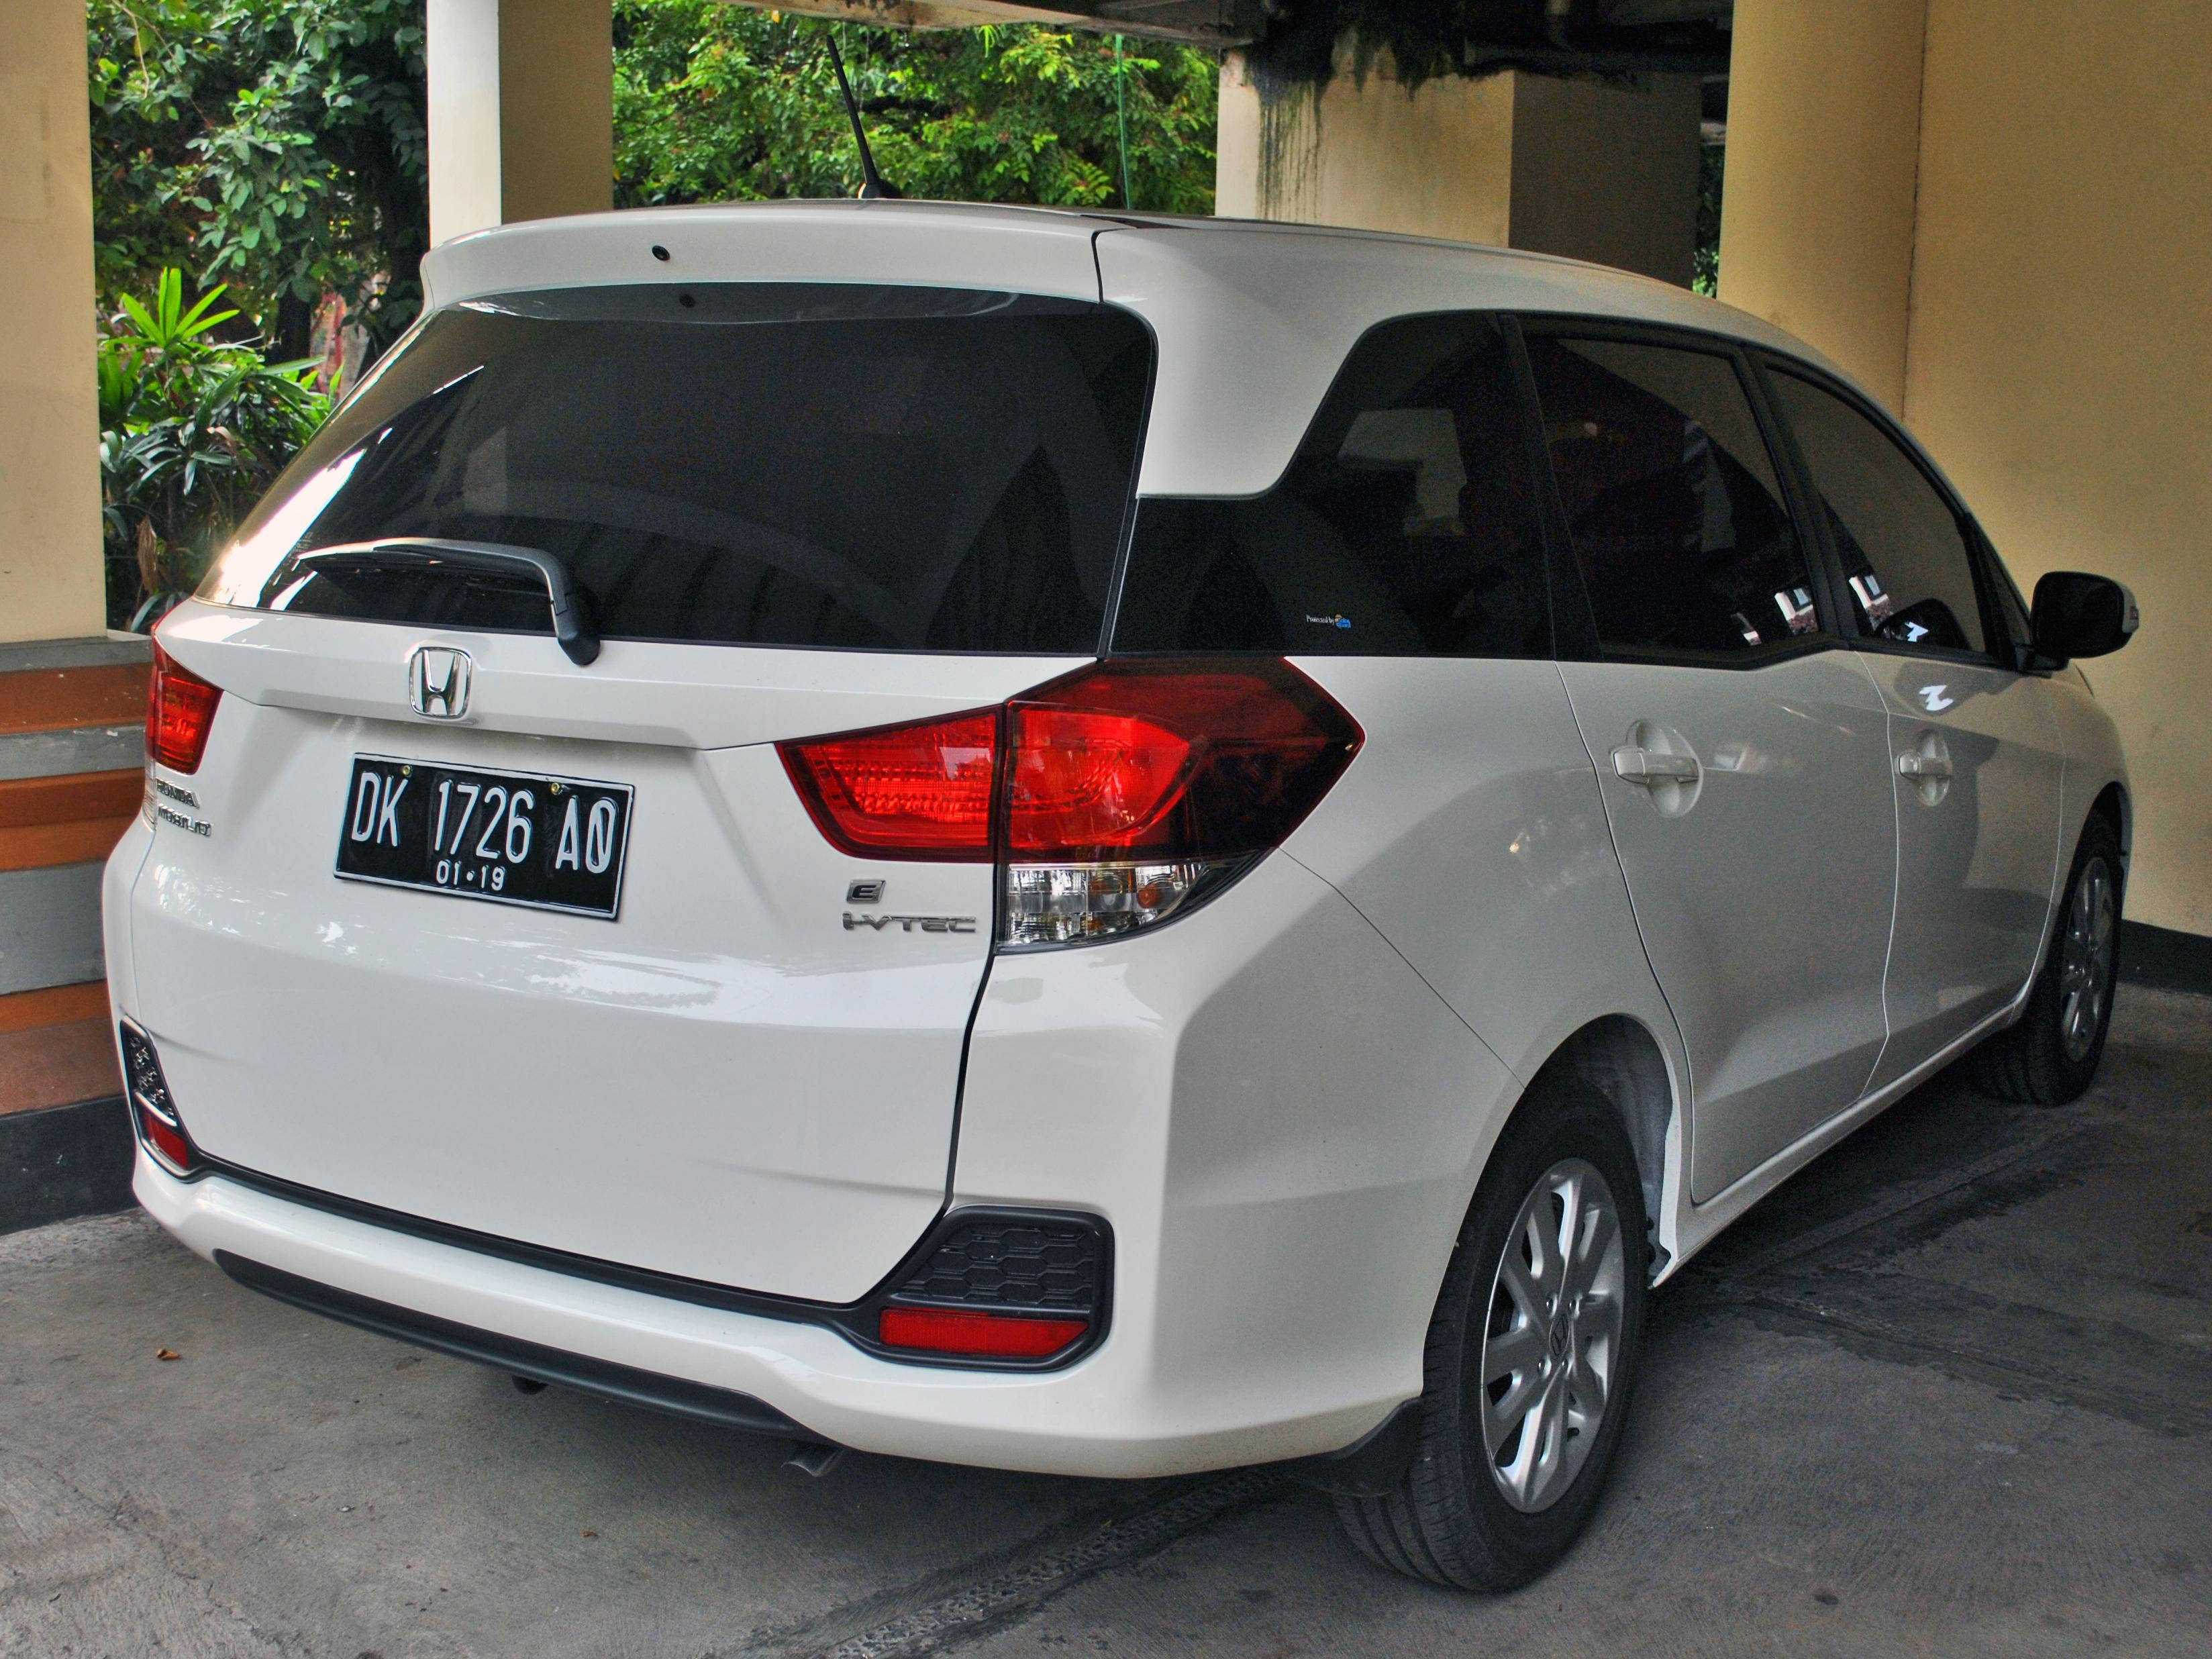 2017 Mobilio >> File:Honda Mobilio (rear).jpg